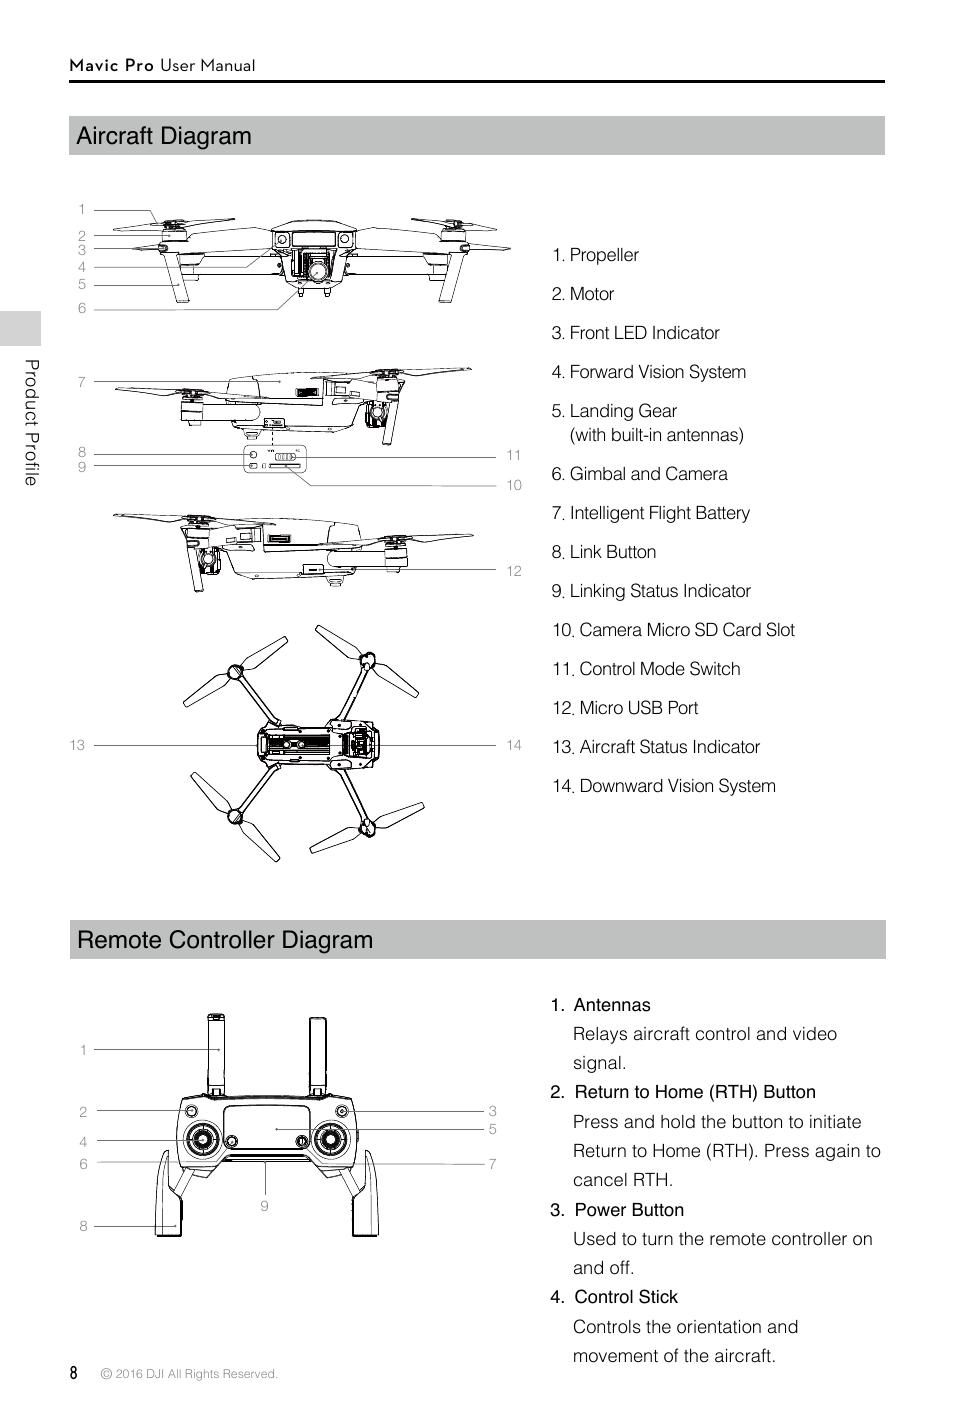 Aircraft diagram, Remote controller diagram, Aircraft